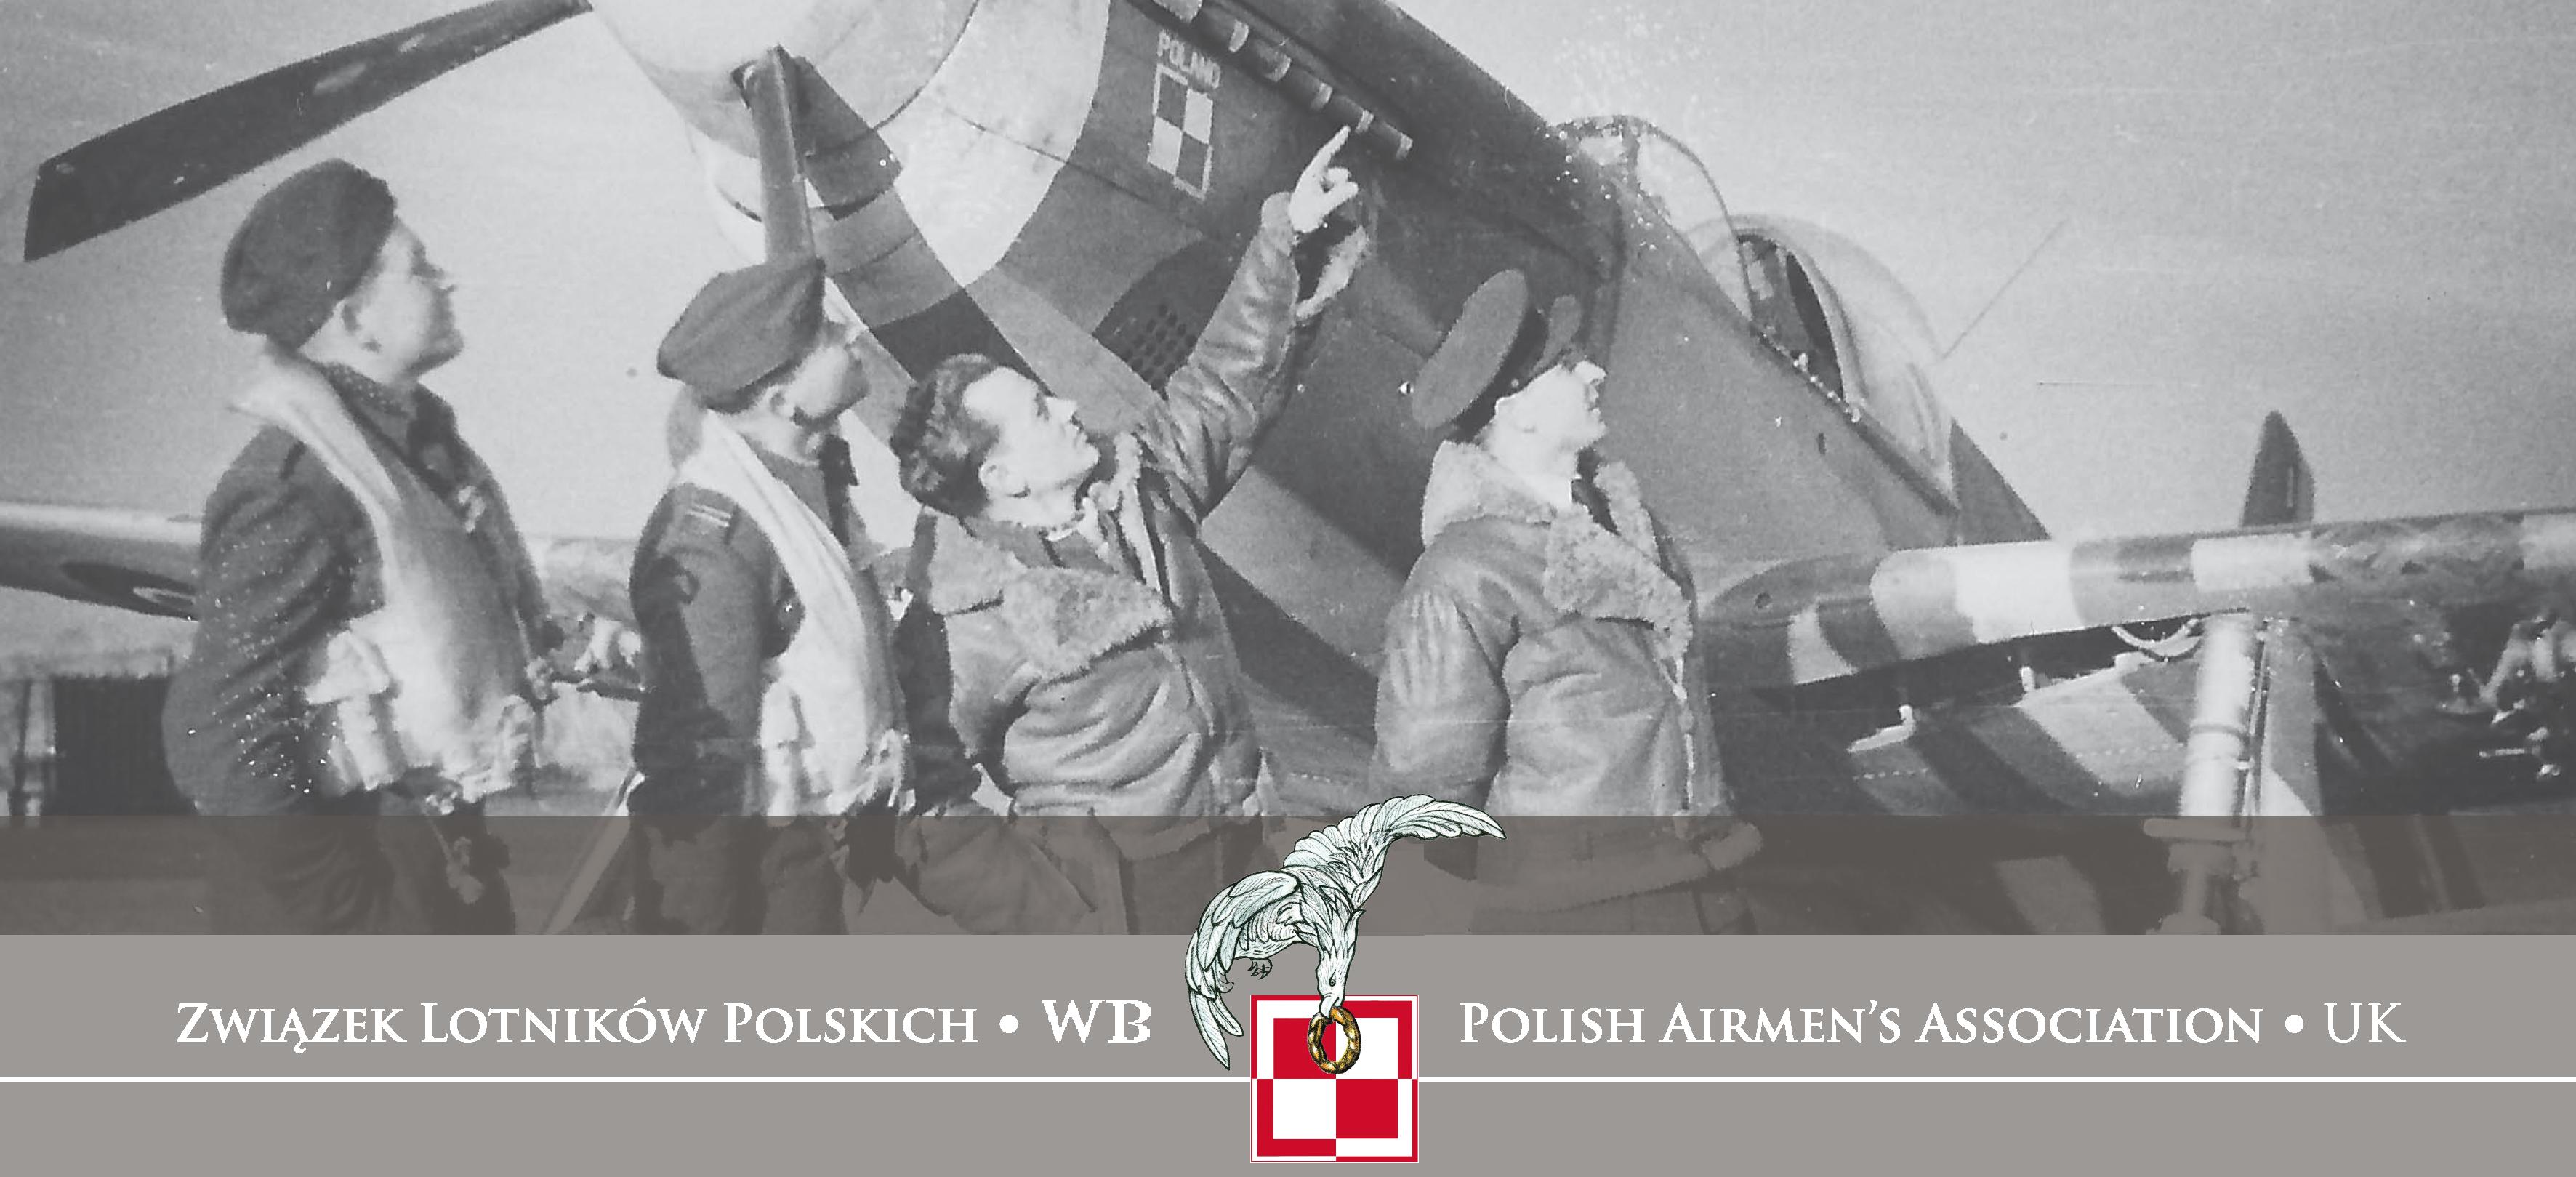 Polish Airmen's Association UK